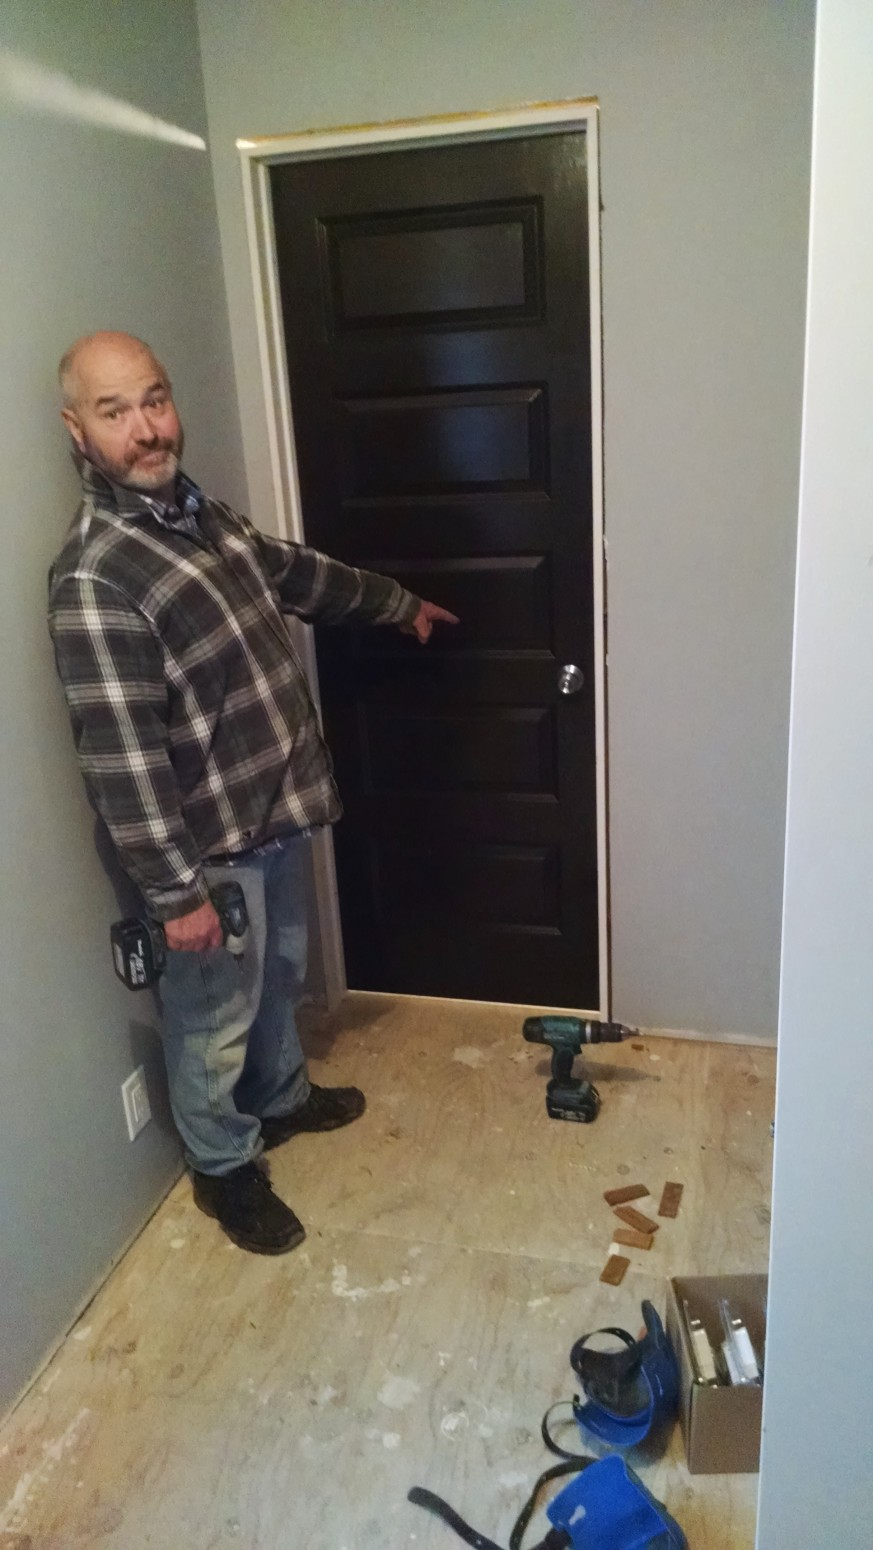 Look - a Door LOL